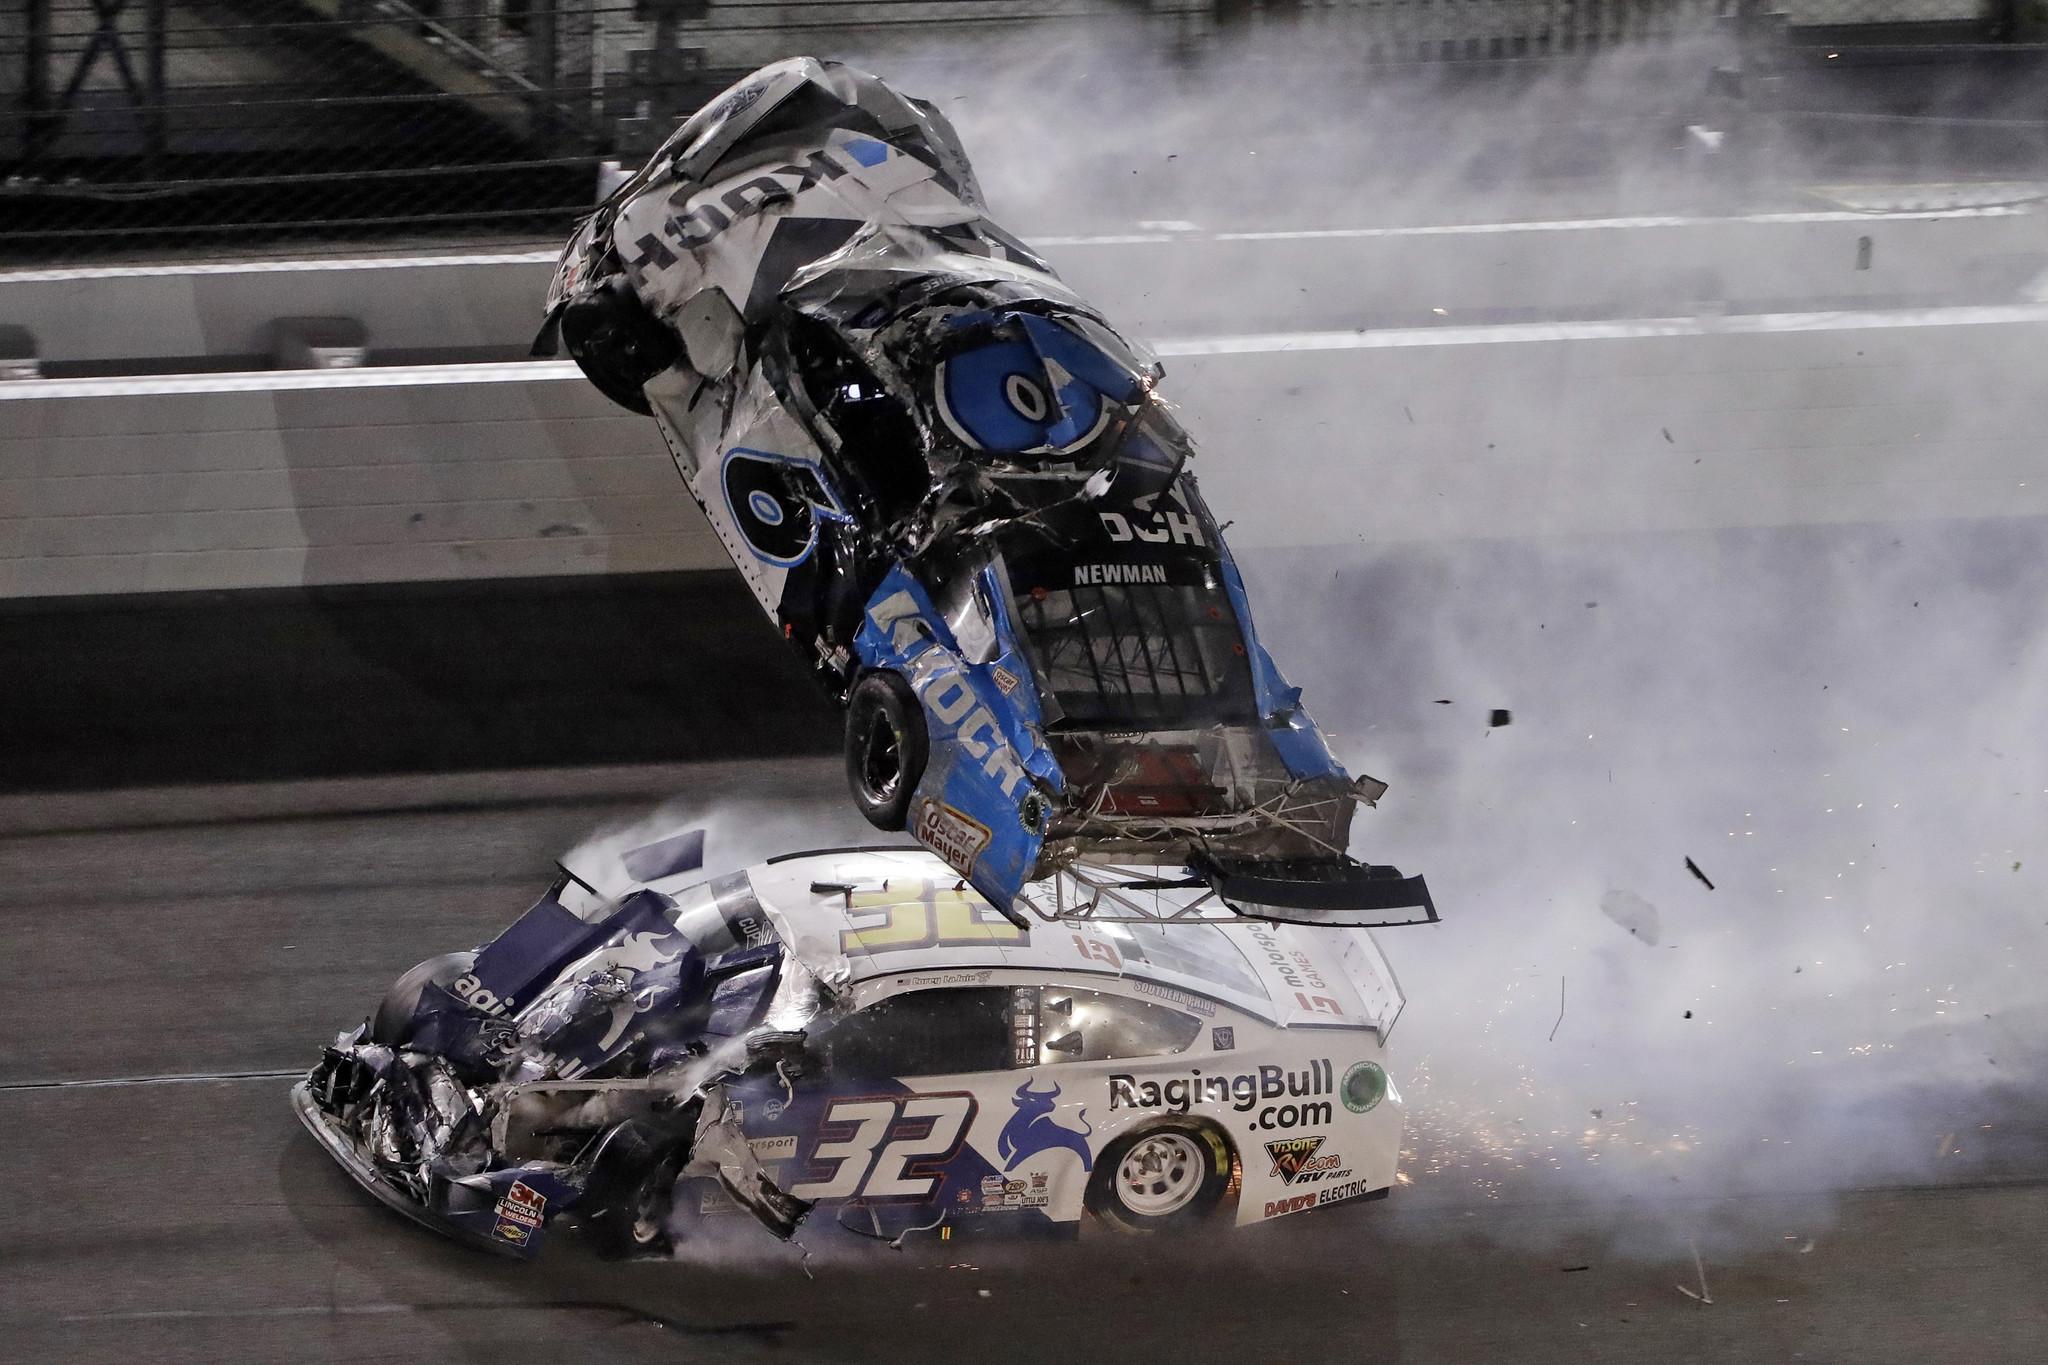 Scary crash at Daytona 500 sends Ryan Newman to the hospital